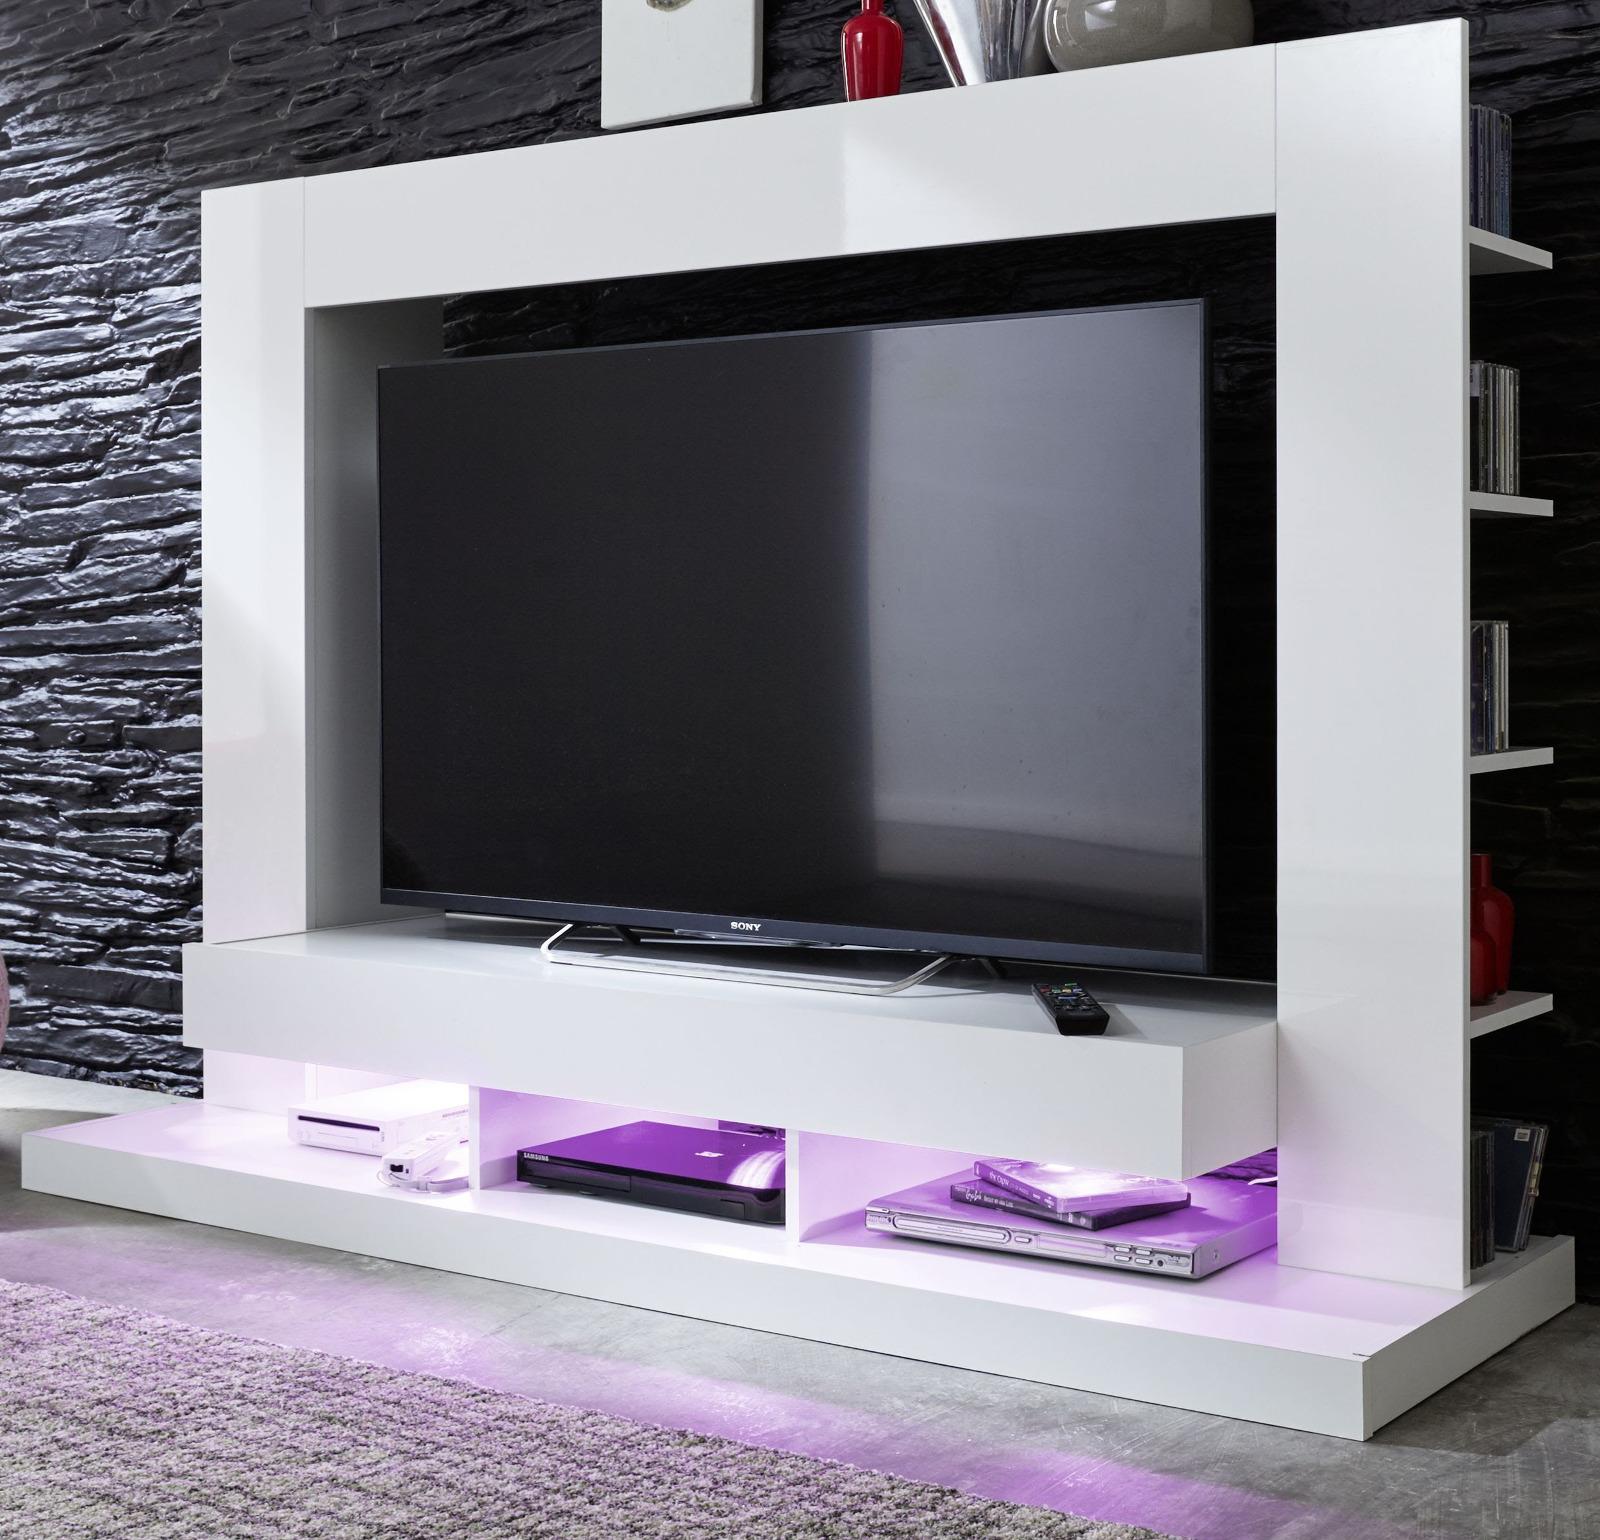 wohnwand tv wand medienwand wei glanz fernsehschrank mediawand cyneplex led rgb ebay. Black Bedroom Furniture Sets. Home Design Ideas